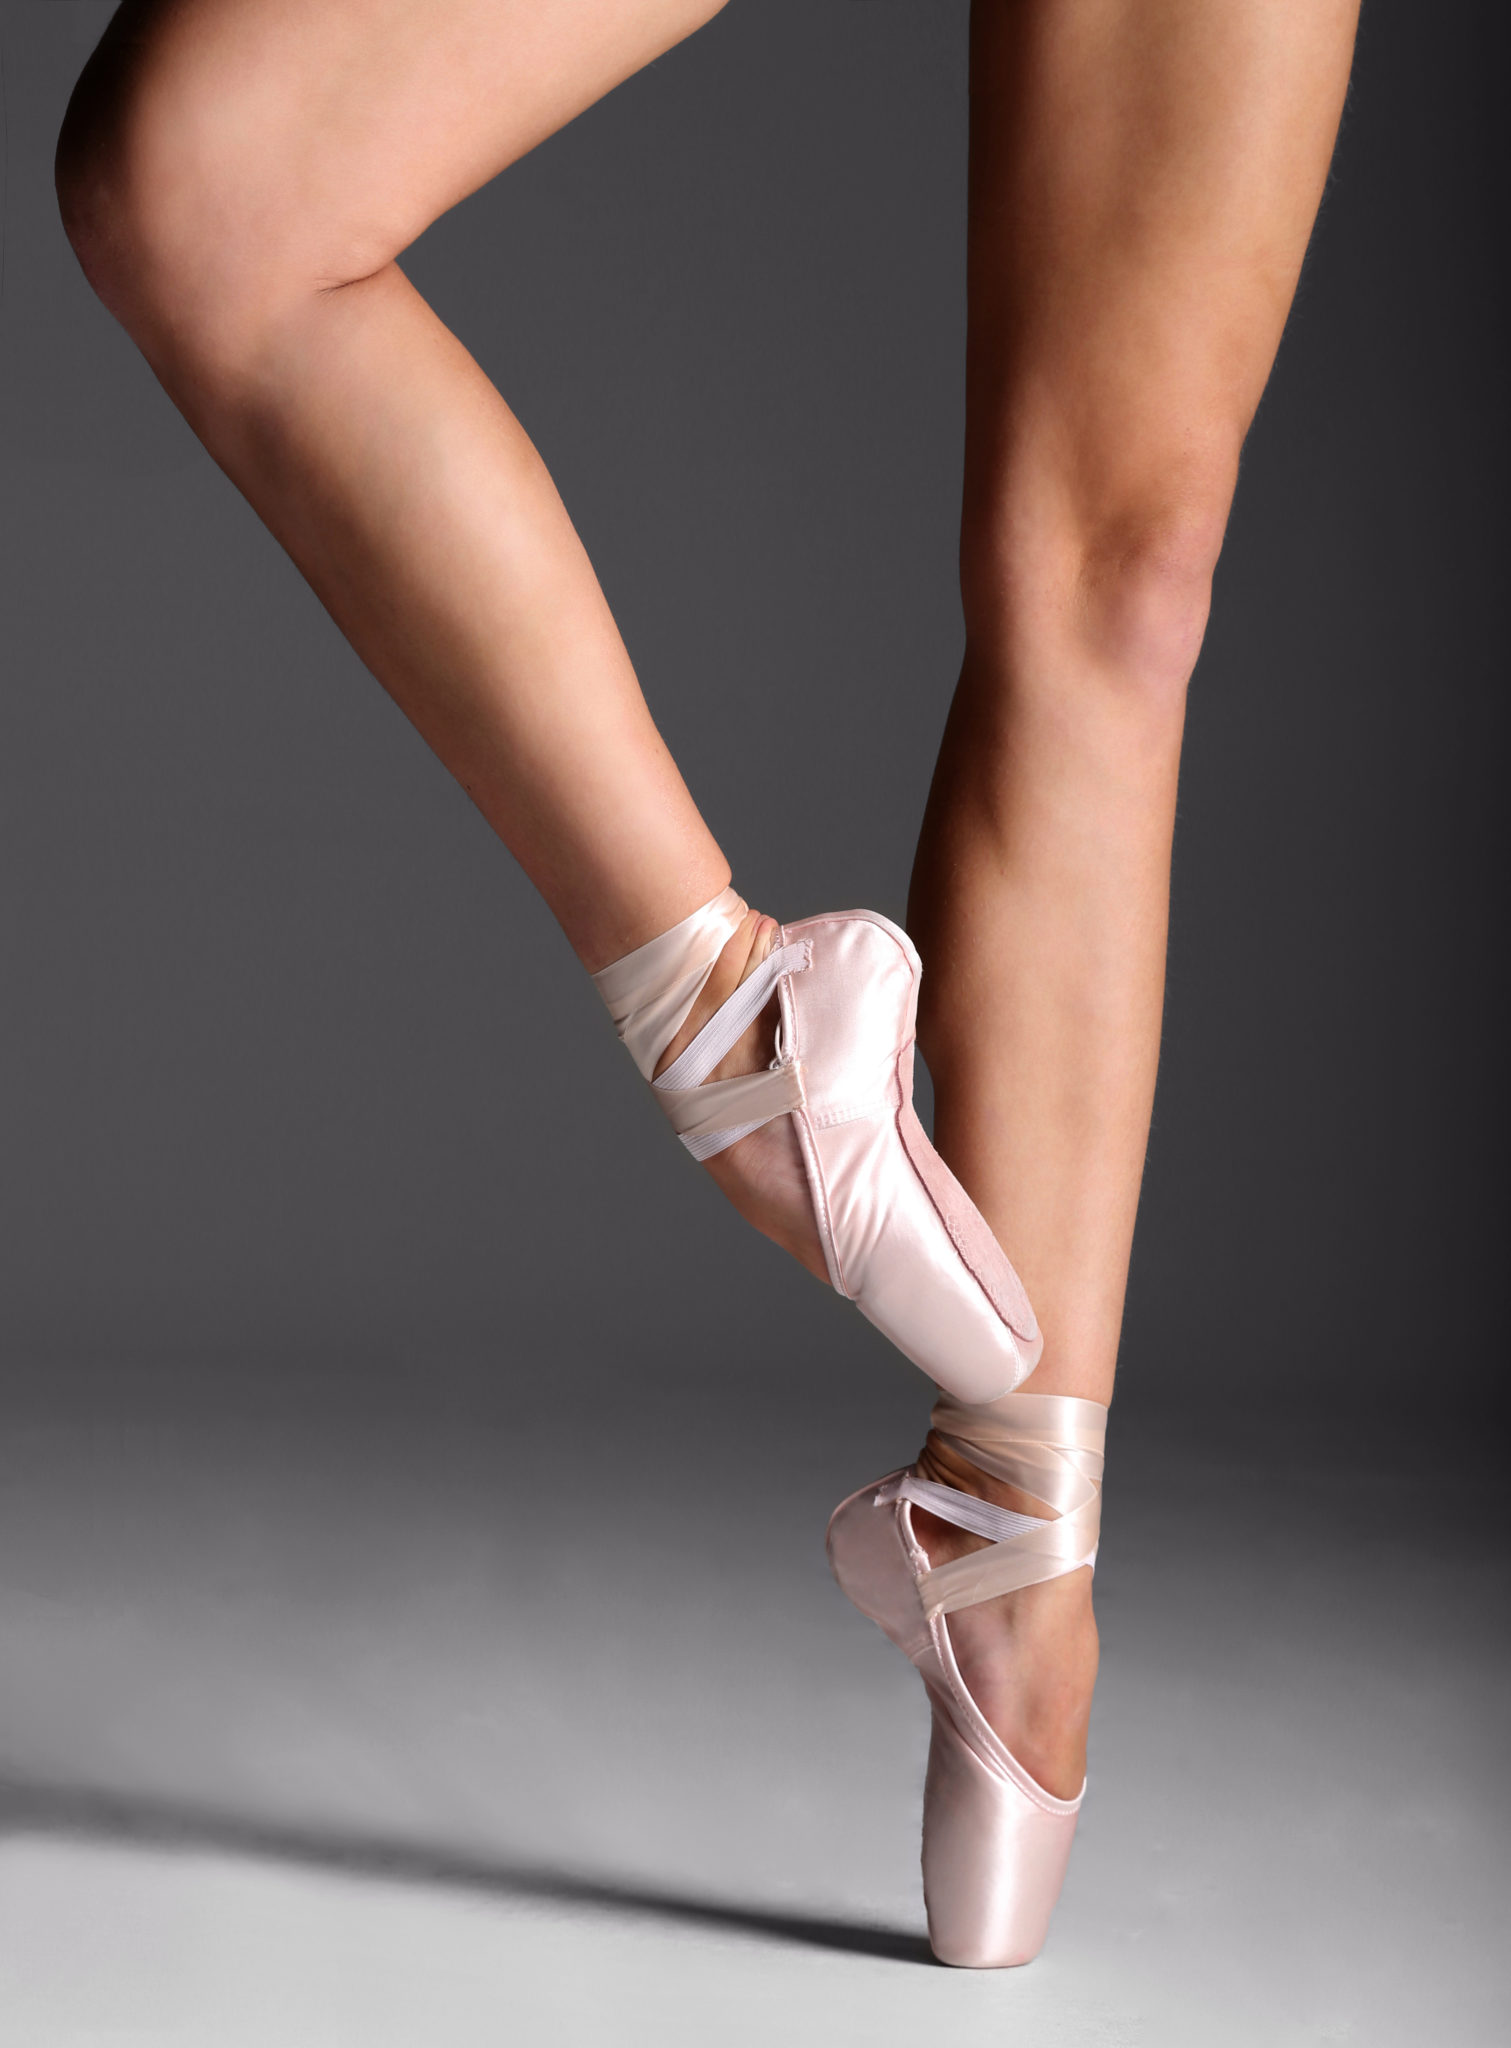 dfbfbe64e7 Sapatilha de Ponta Pirouette - Evidence Ballet - Loja Virtual